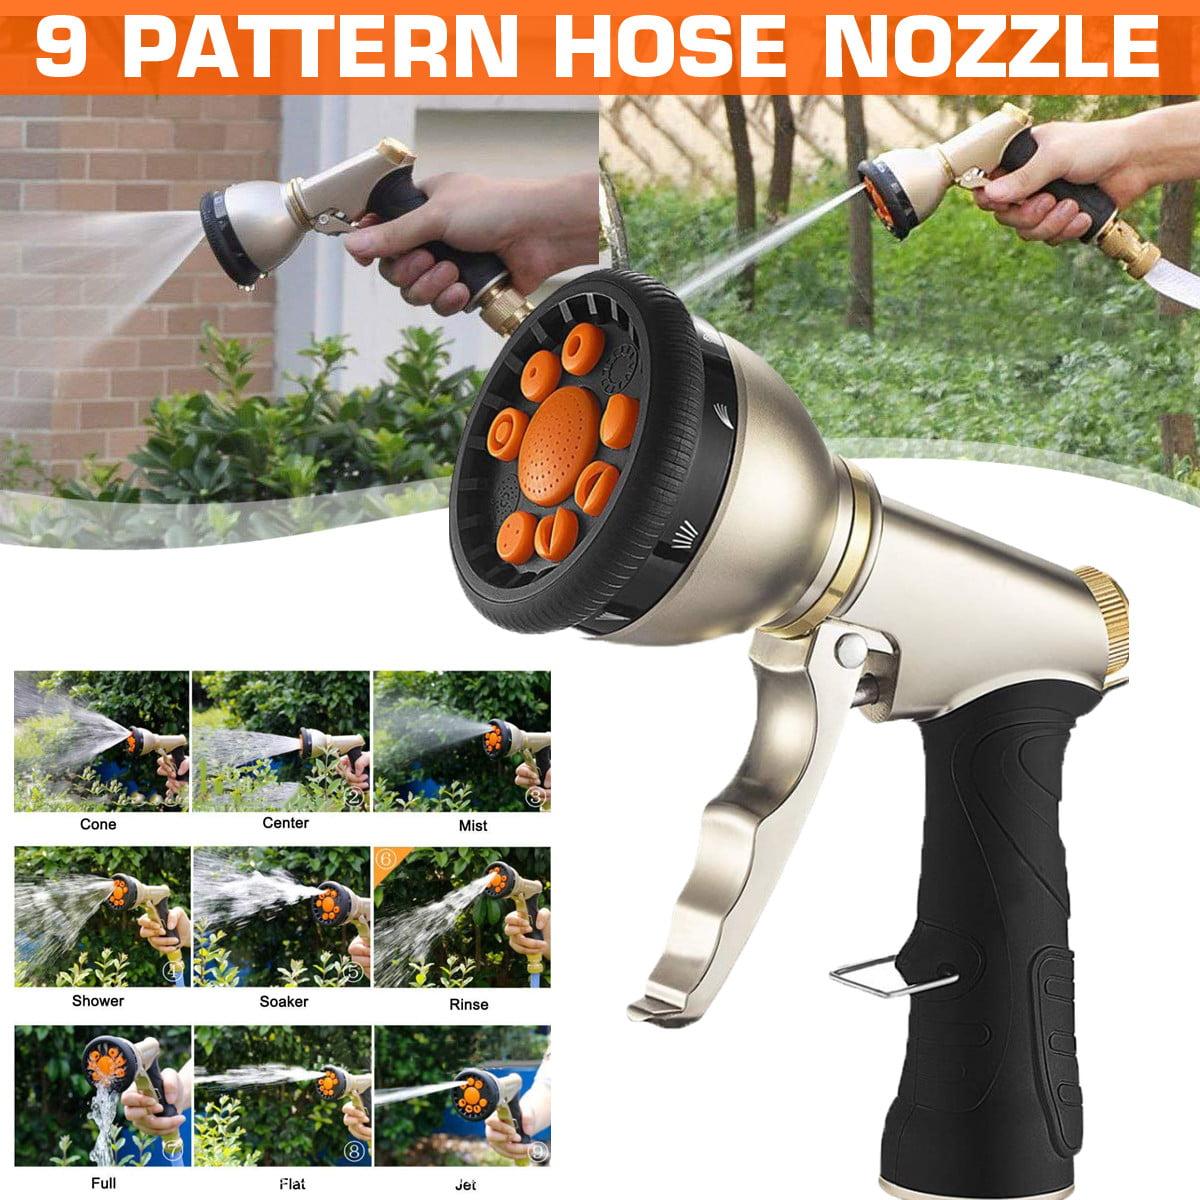 niahode Garden Hose Nozzle Short,Silver Heavy Duty Metal Spray Gun 360/° Rotating Water Adjustment High Pressure Leak Proof Pistol Grip Sprayer for Car Washing,Plants Watering,Pets Shower Cleaning